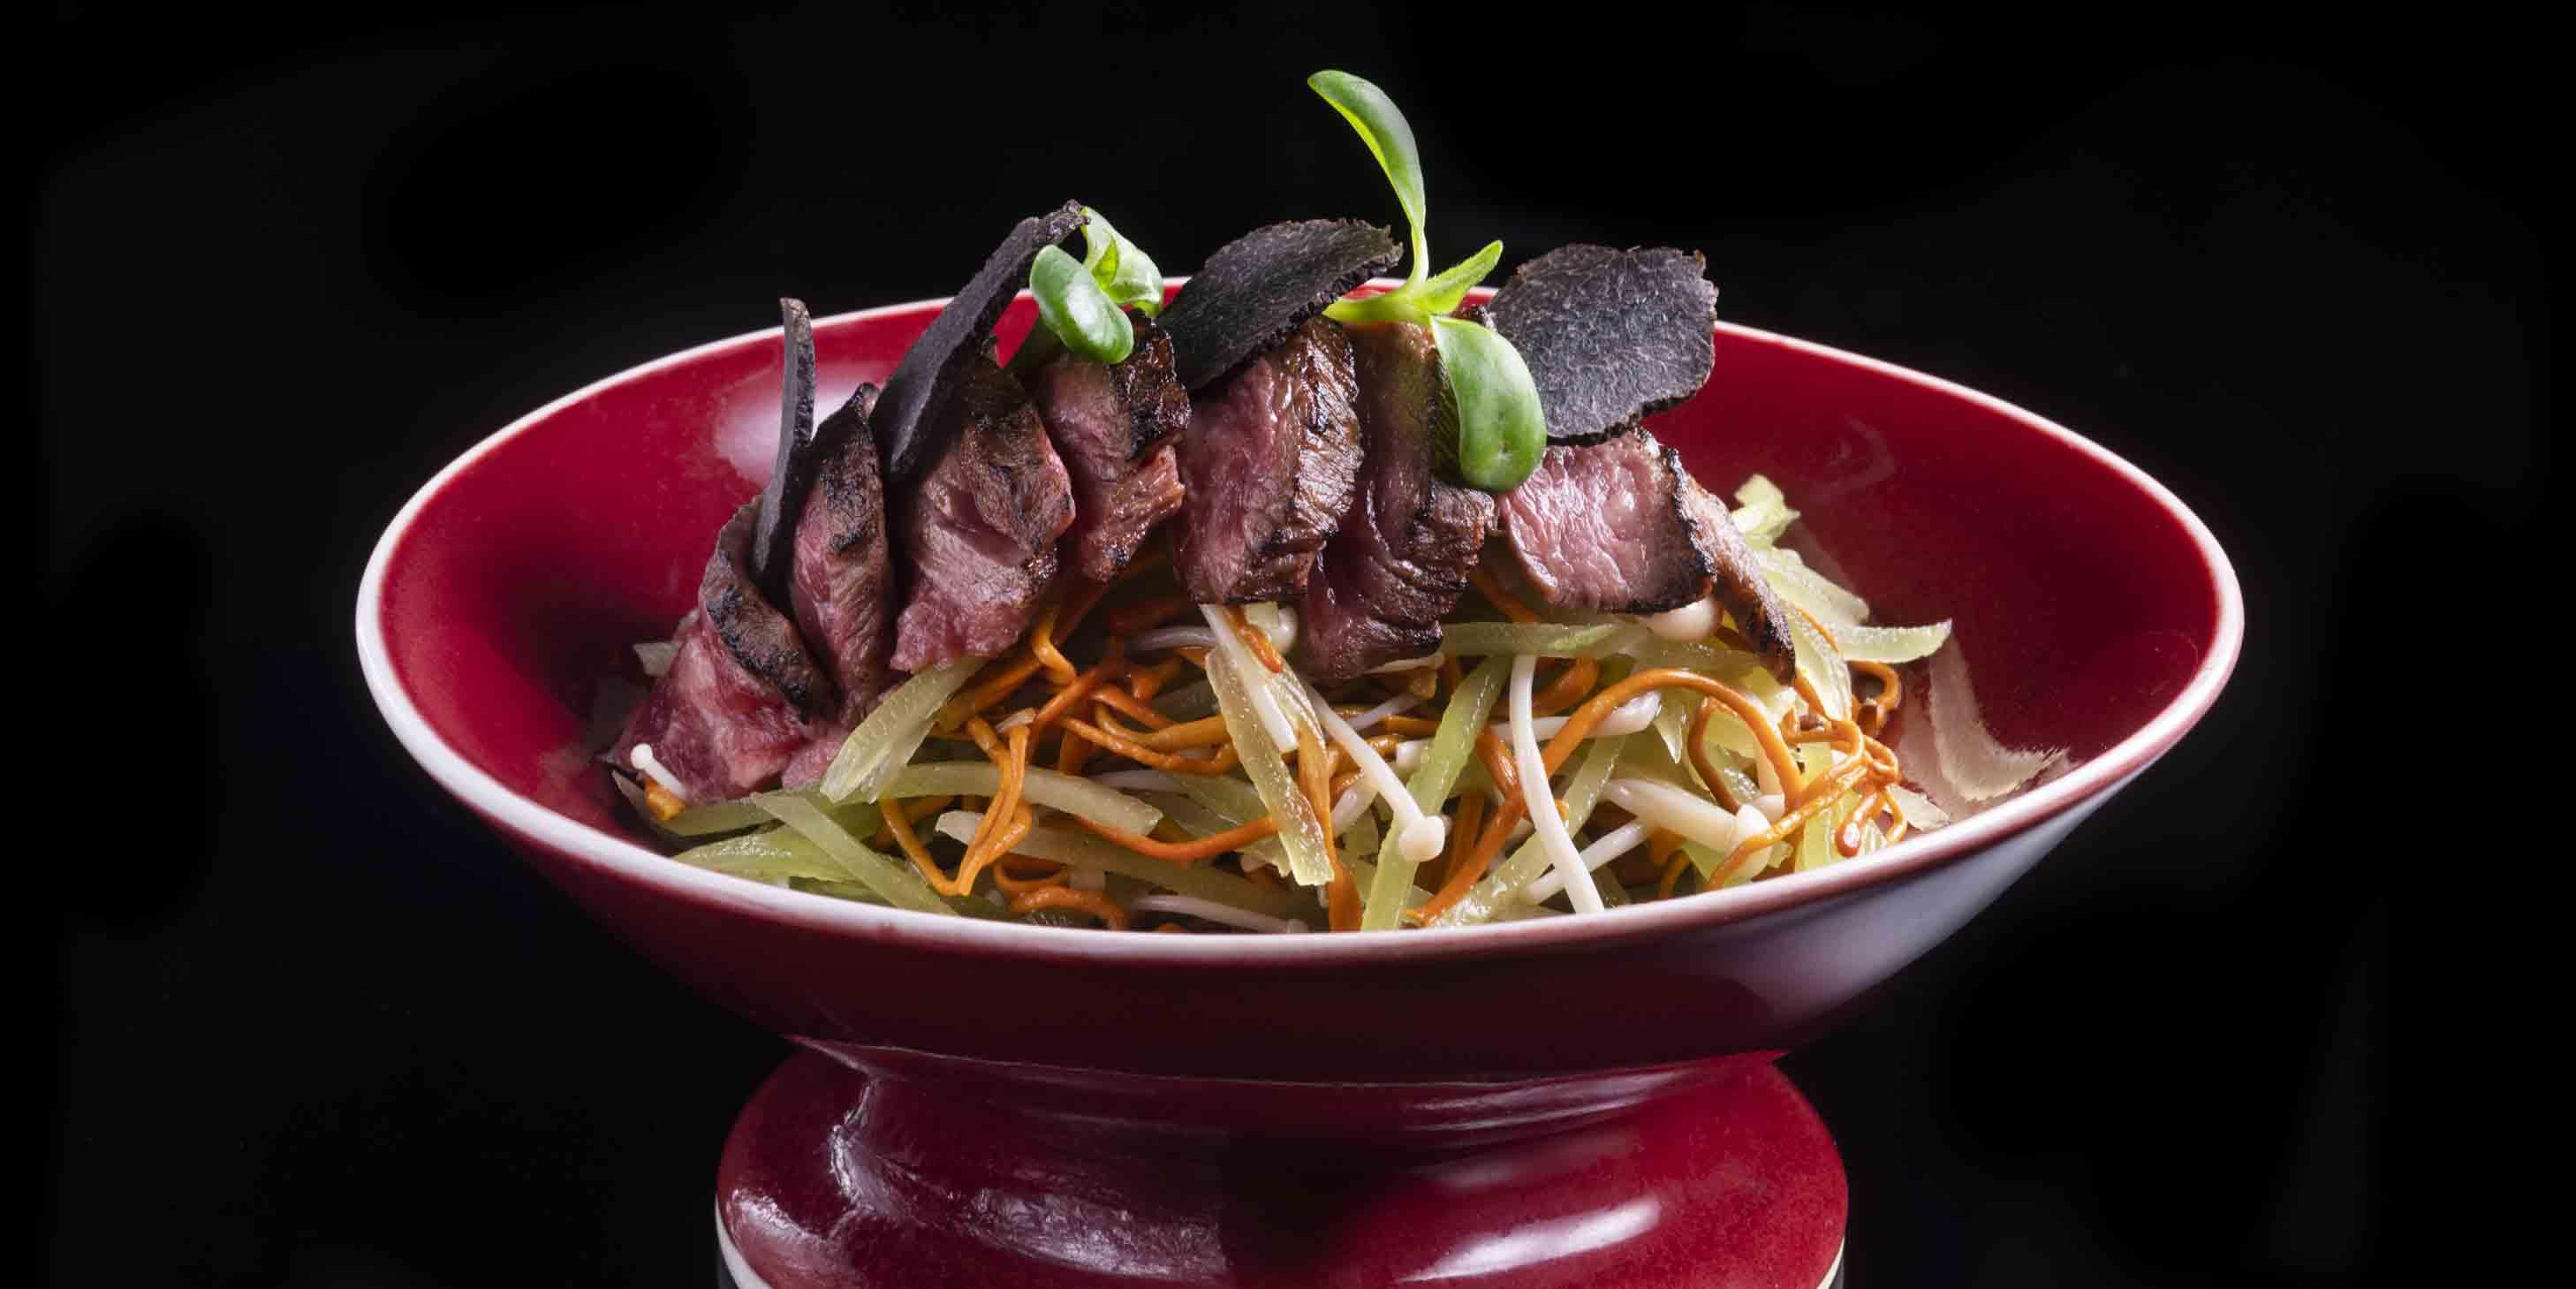 Beef Tongue Salad of Hakkasan located on the bund